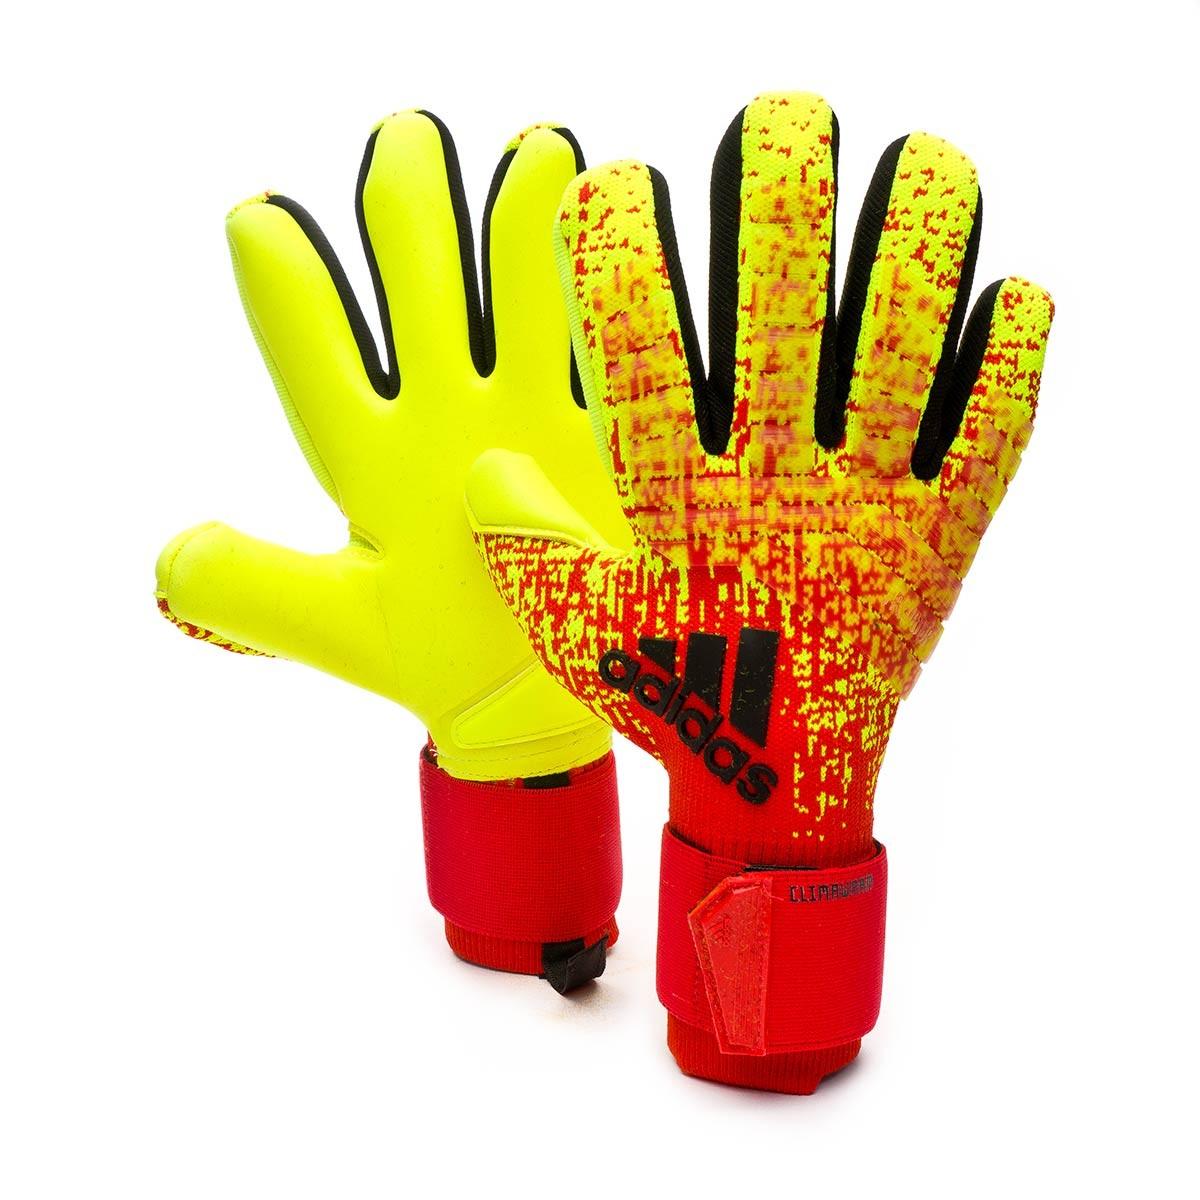 cheap price a few days away best wholesaler adidas Predator Pro CW Glove